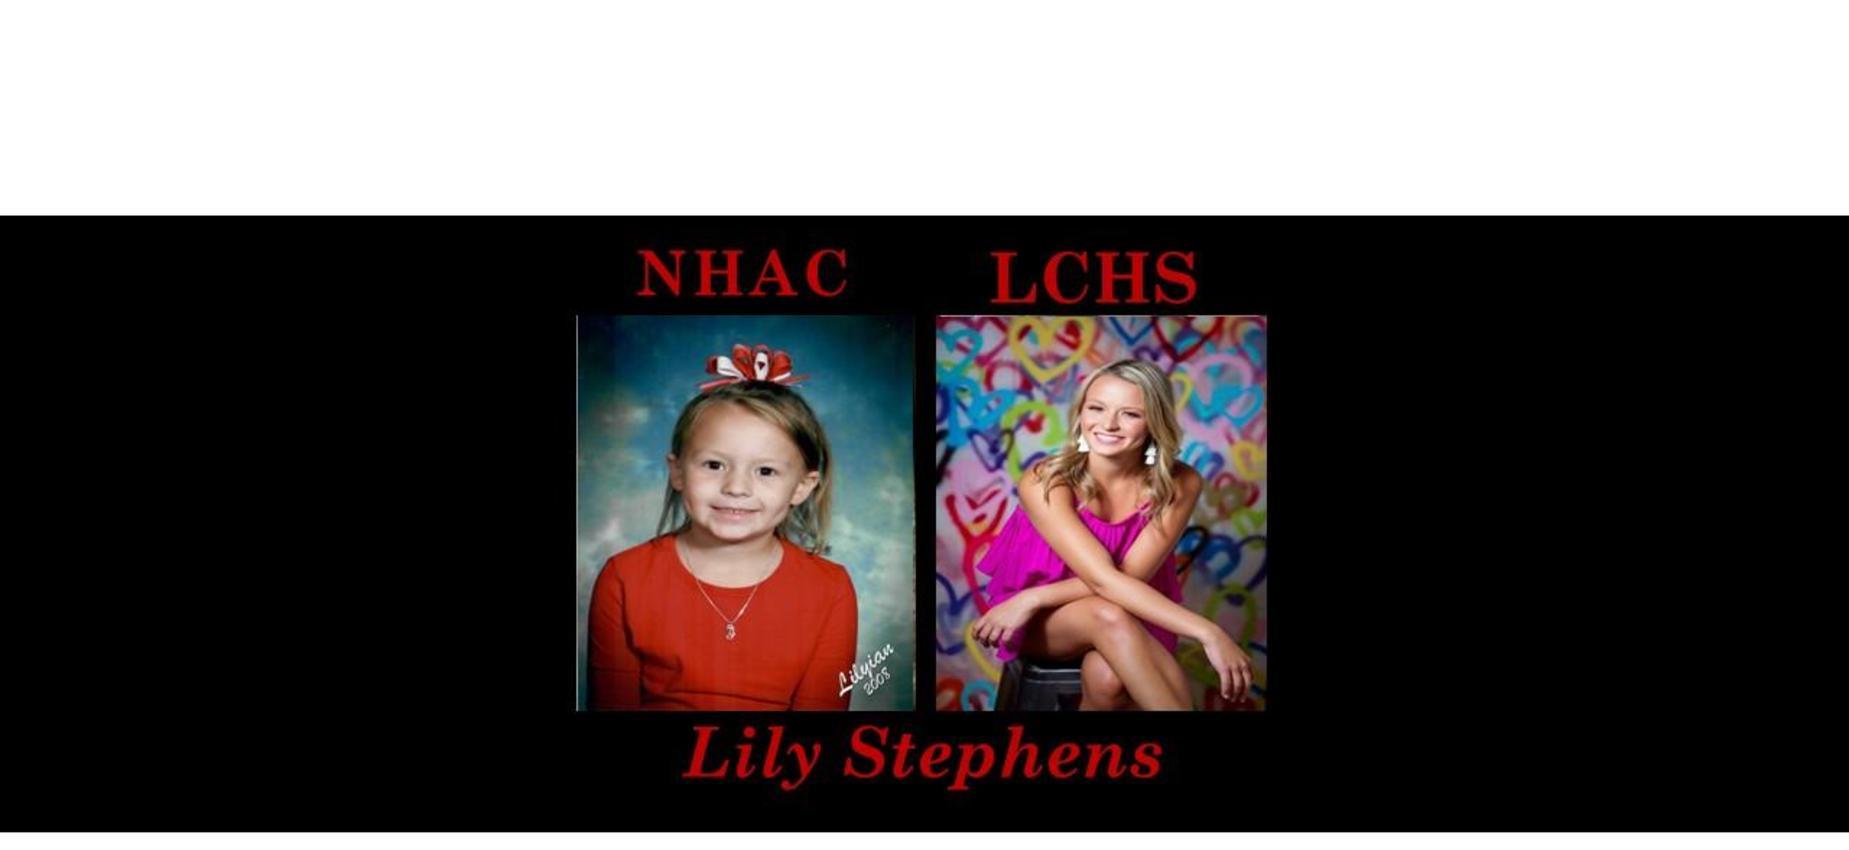 Lily Stephens